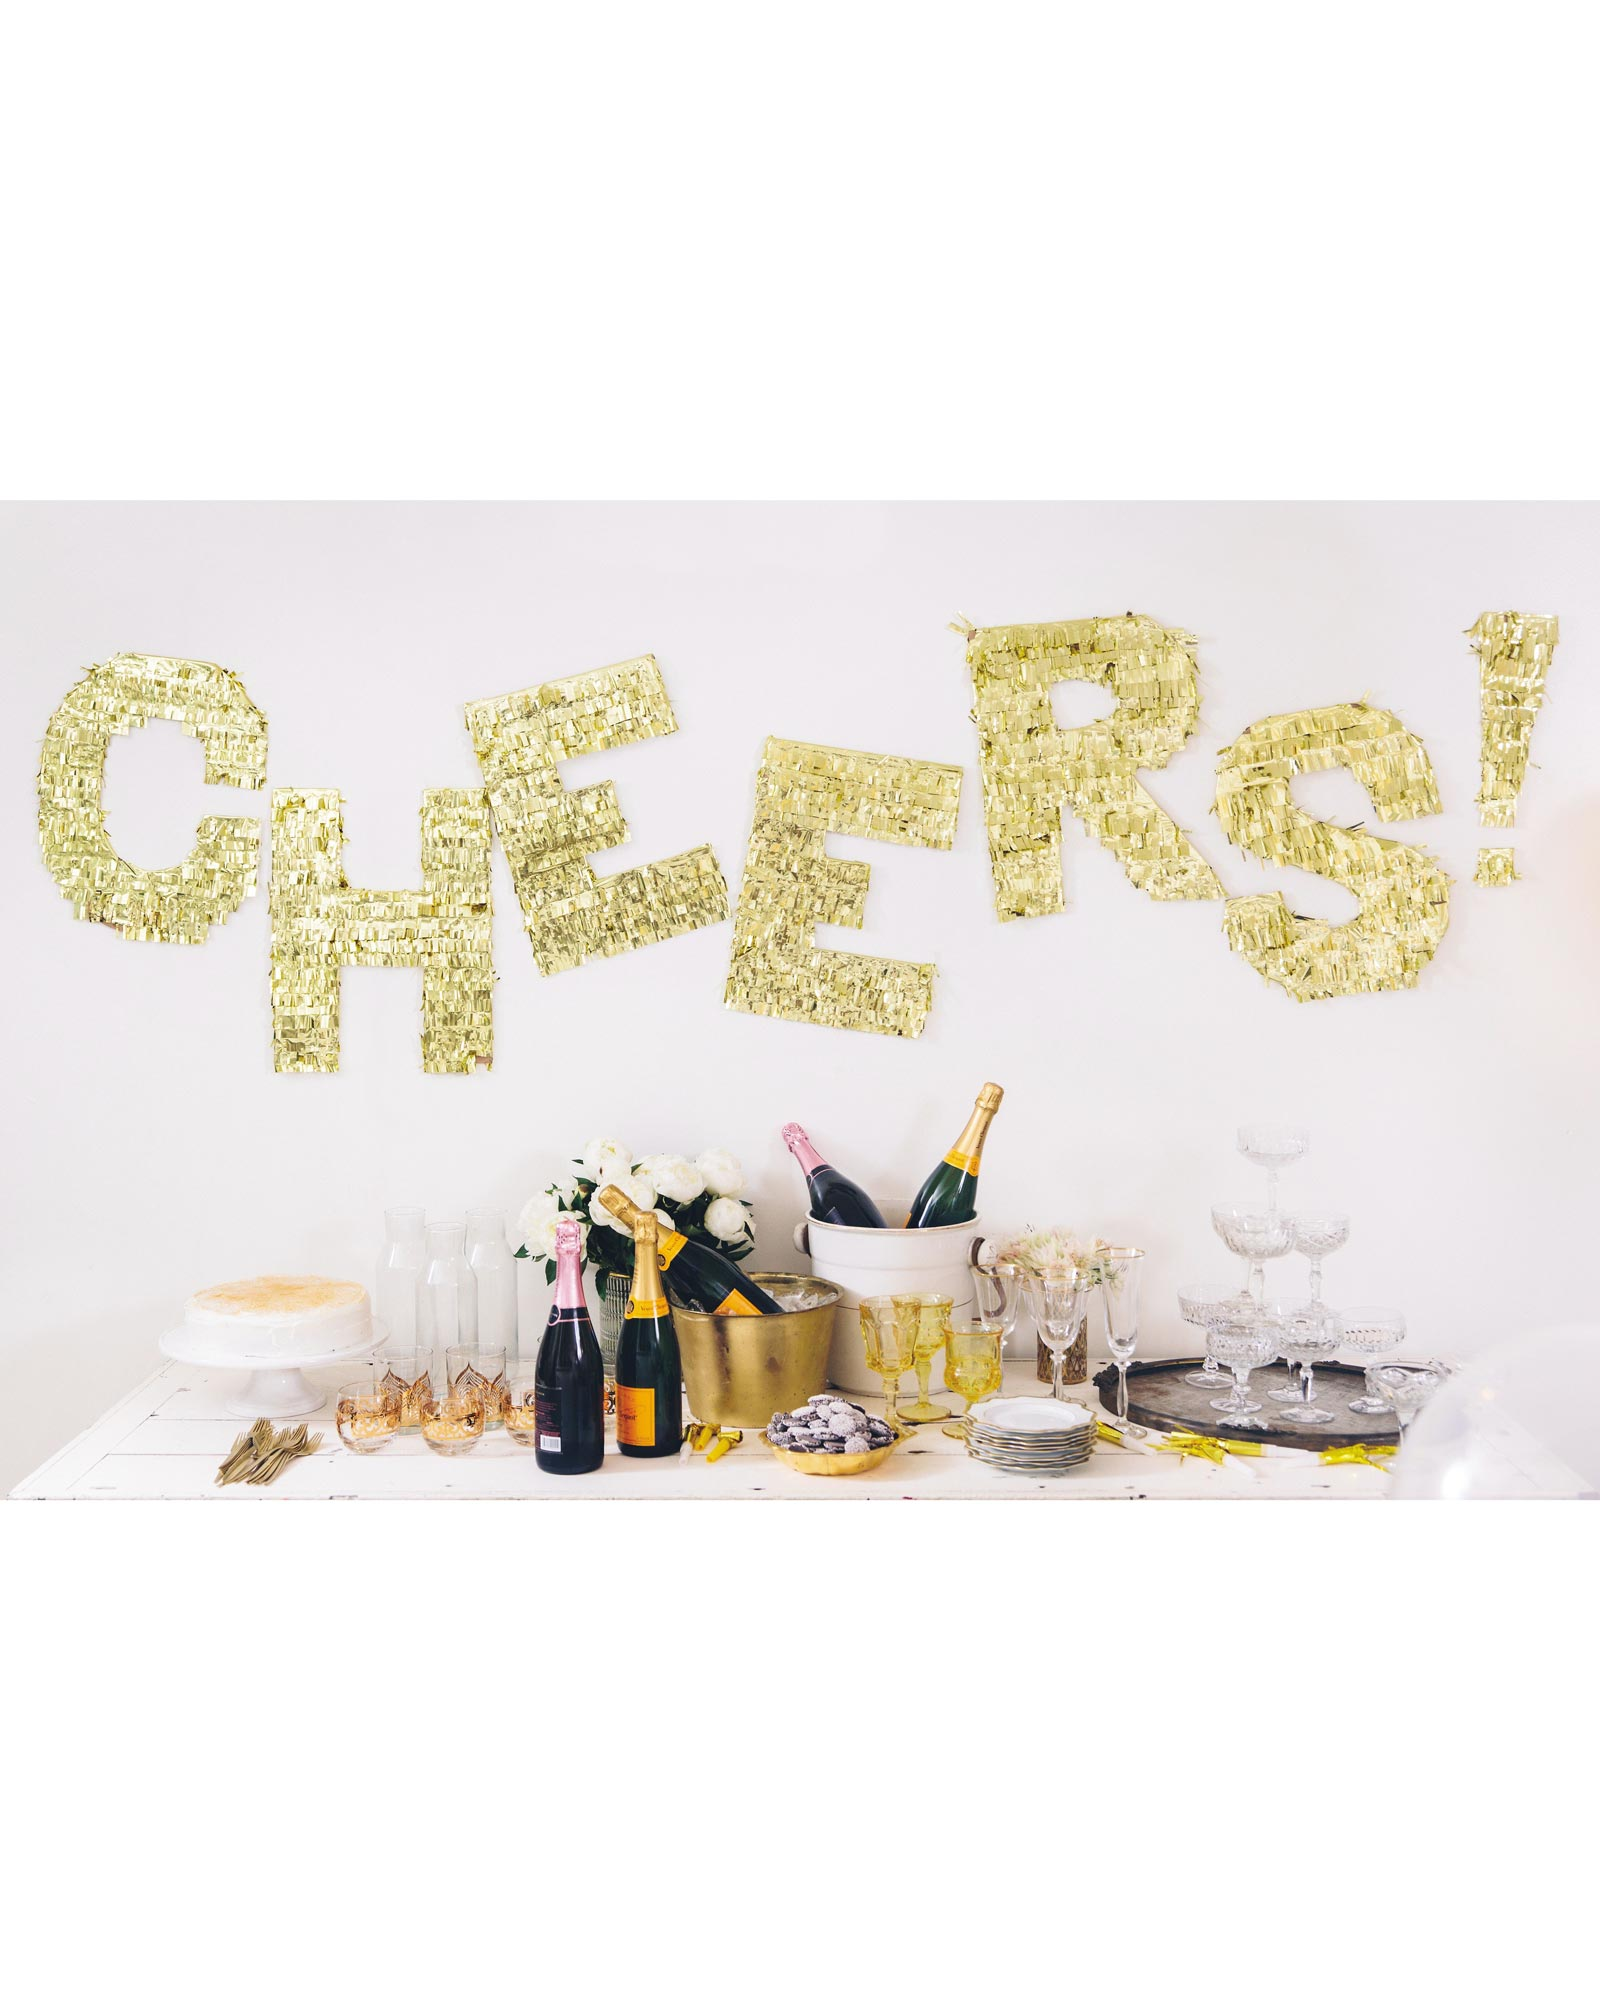 darcys-diary-lauren-conrad-celebrate-cheers-0316.jpg